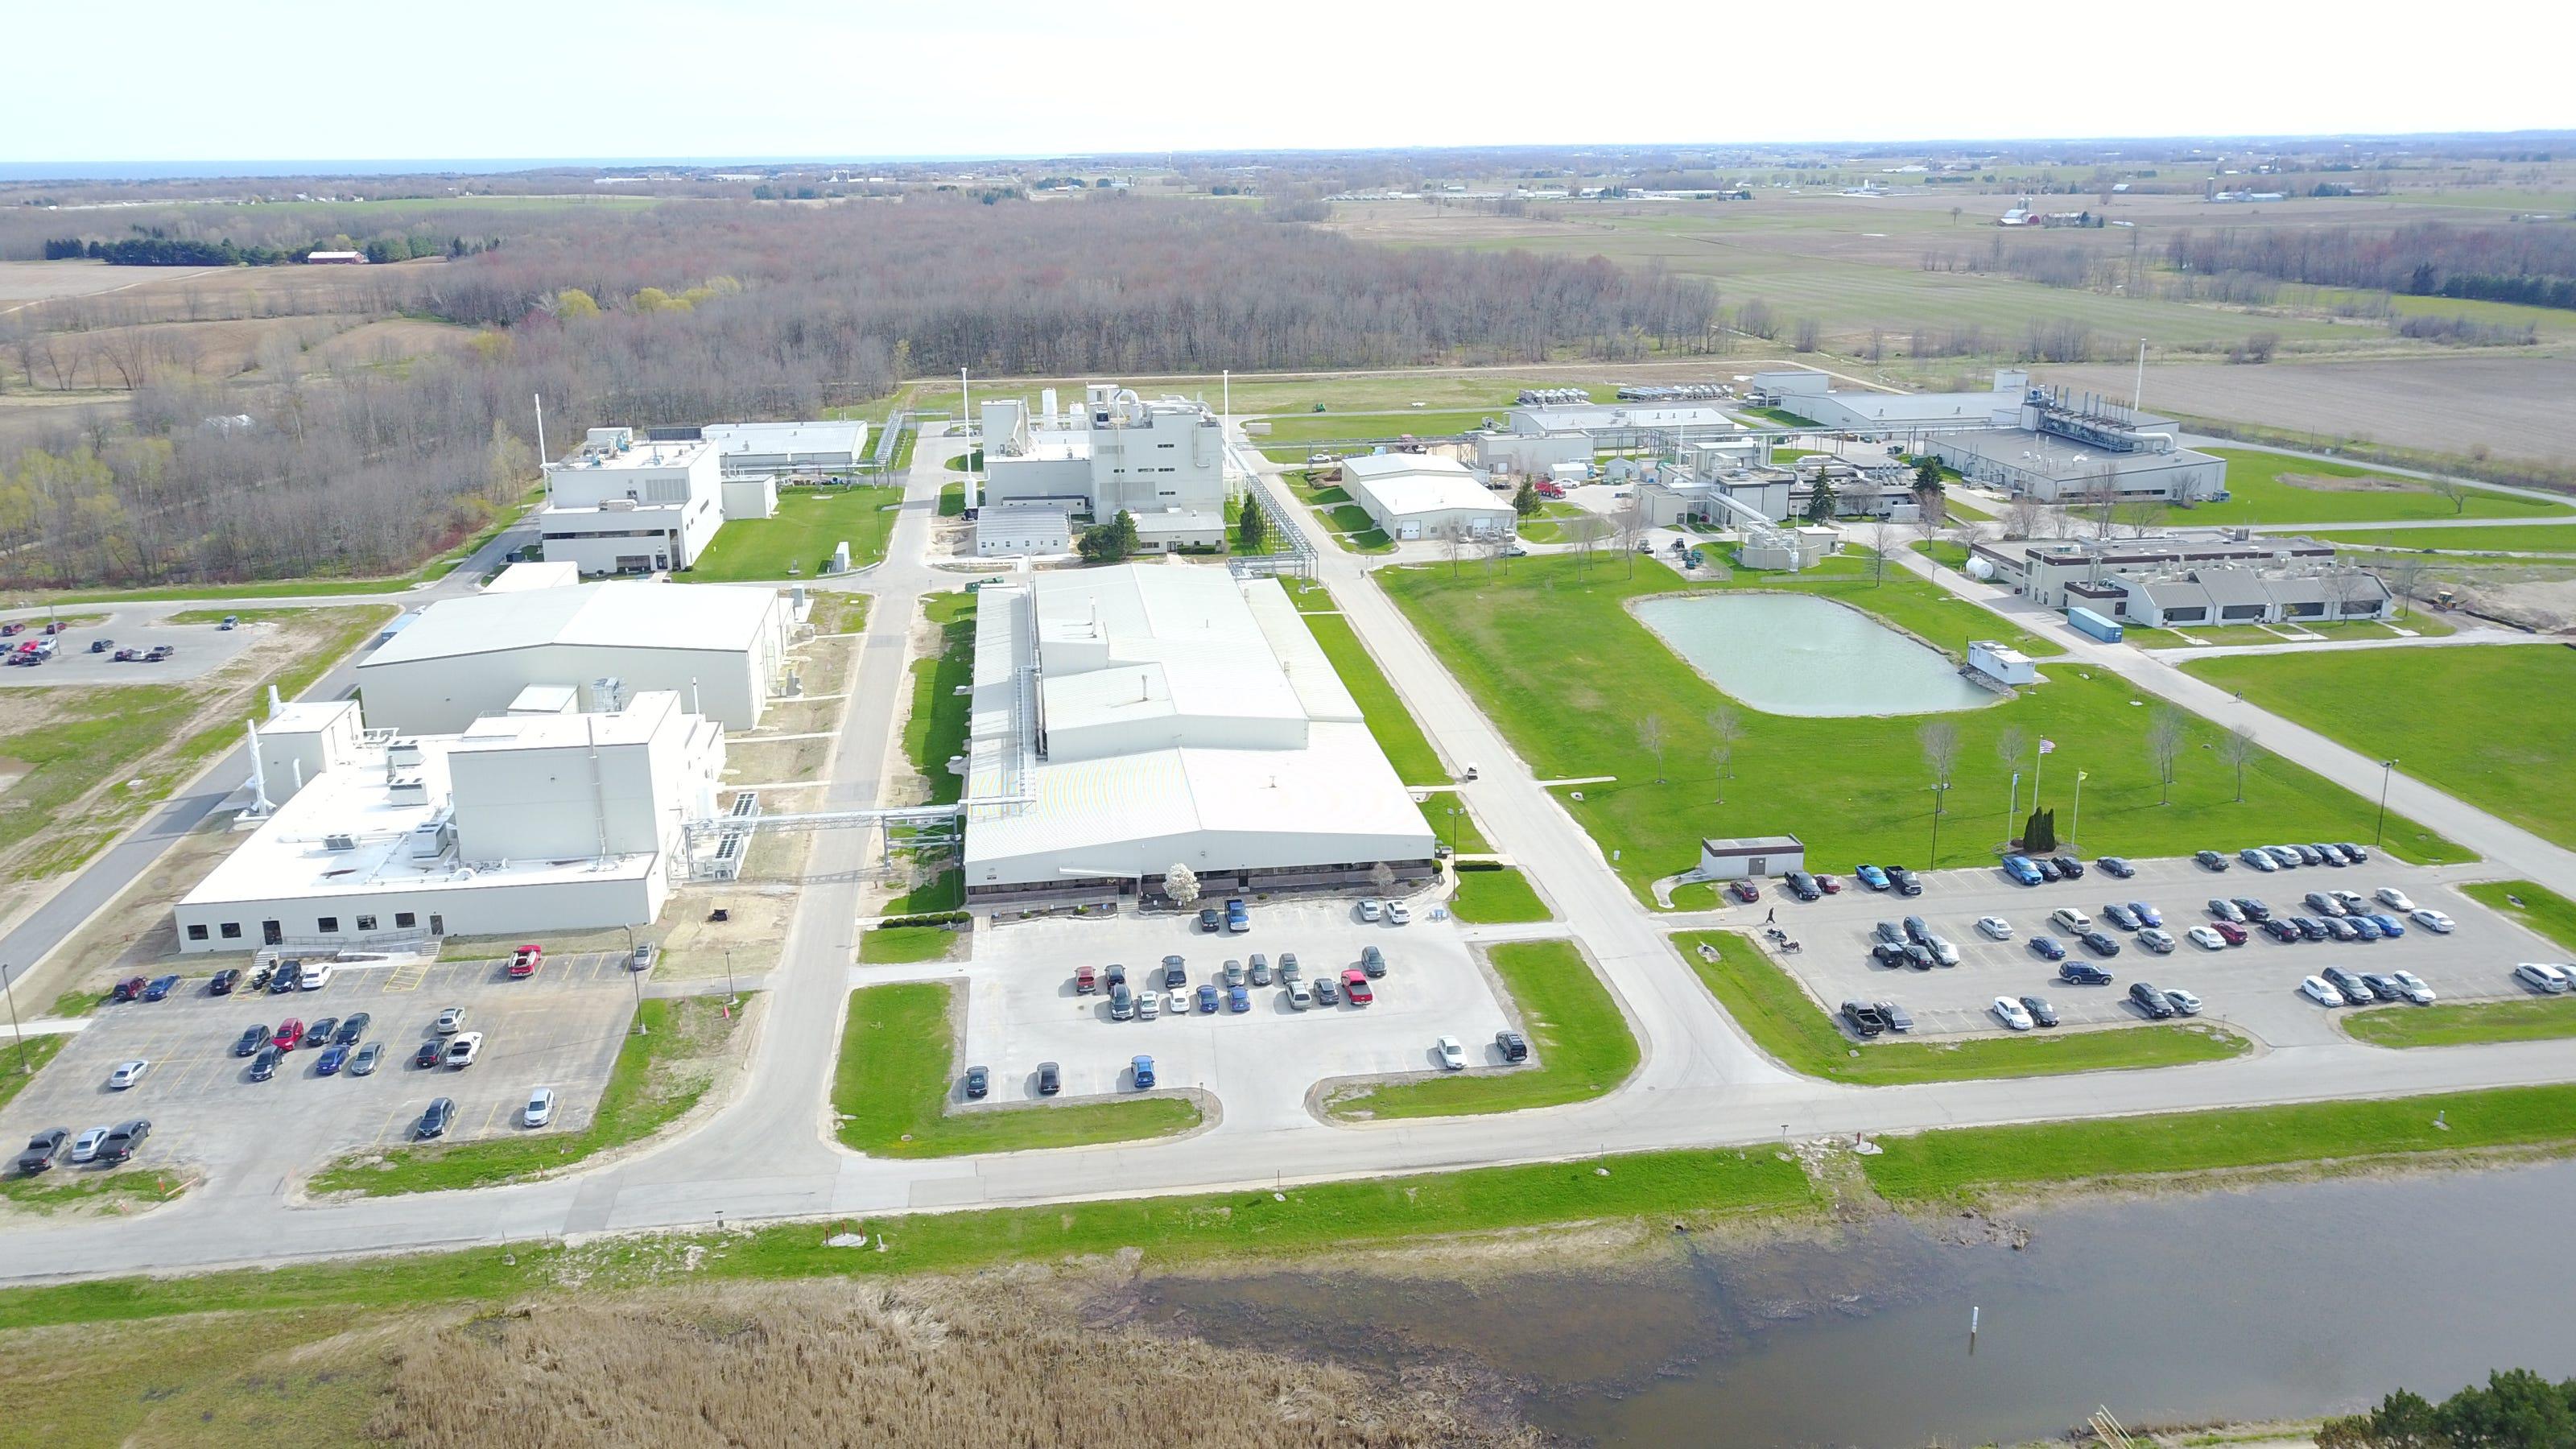 Sheboygan County is seeing an increase in Legionnaires' disease; two facilities under investigation - Sheboygan Press